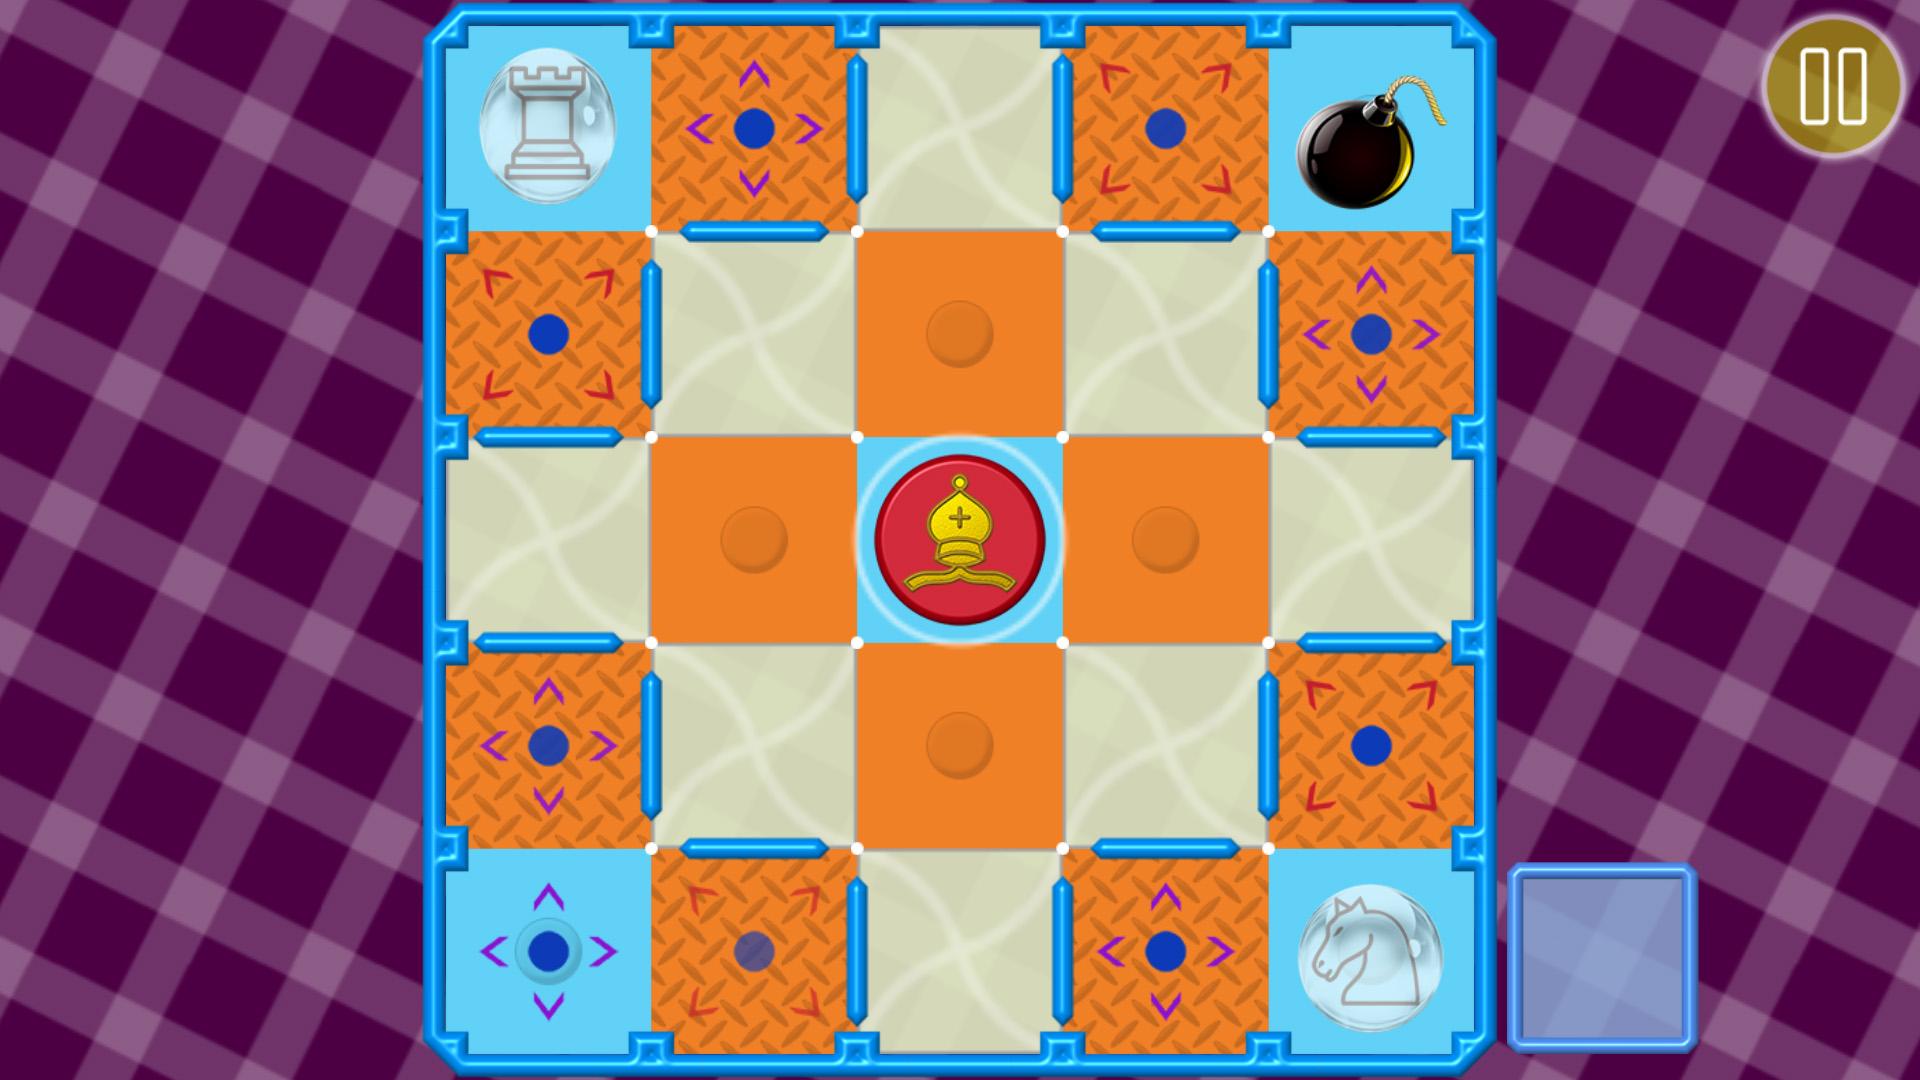 http://onpixelgames.com/wp-content/uploads/2017/09/Stage-5-13.jpg